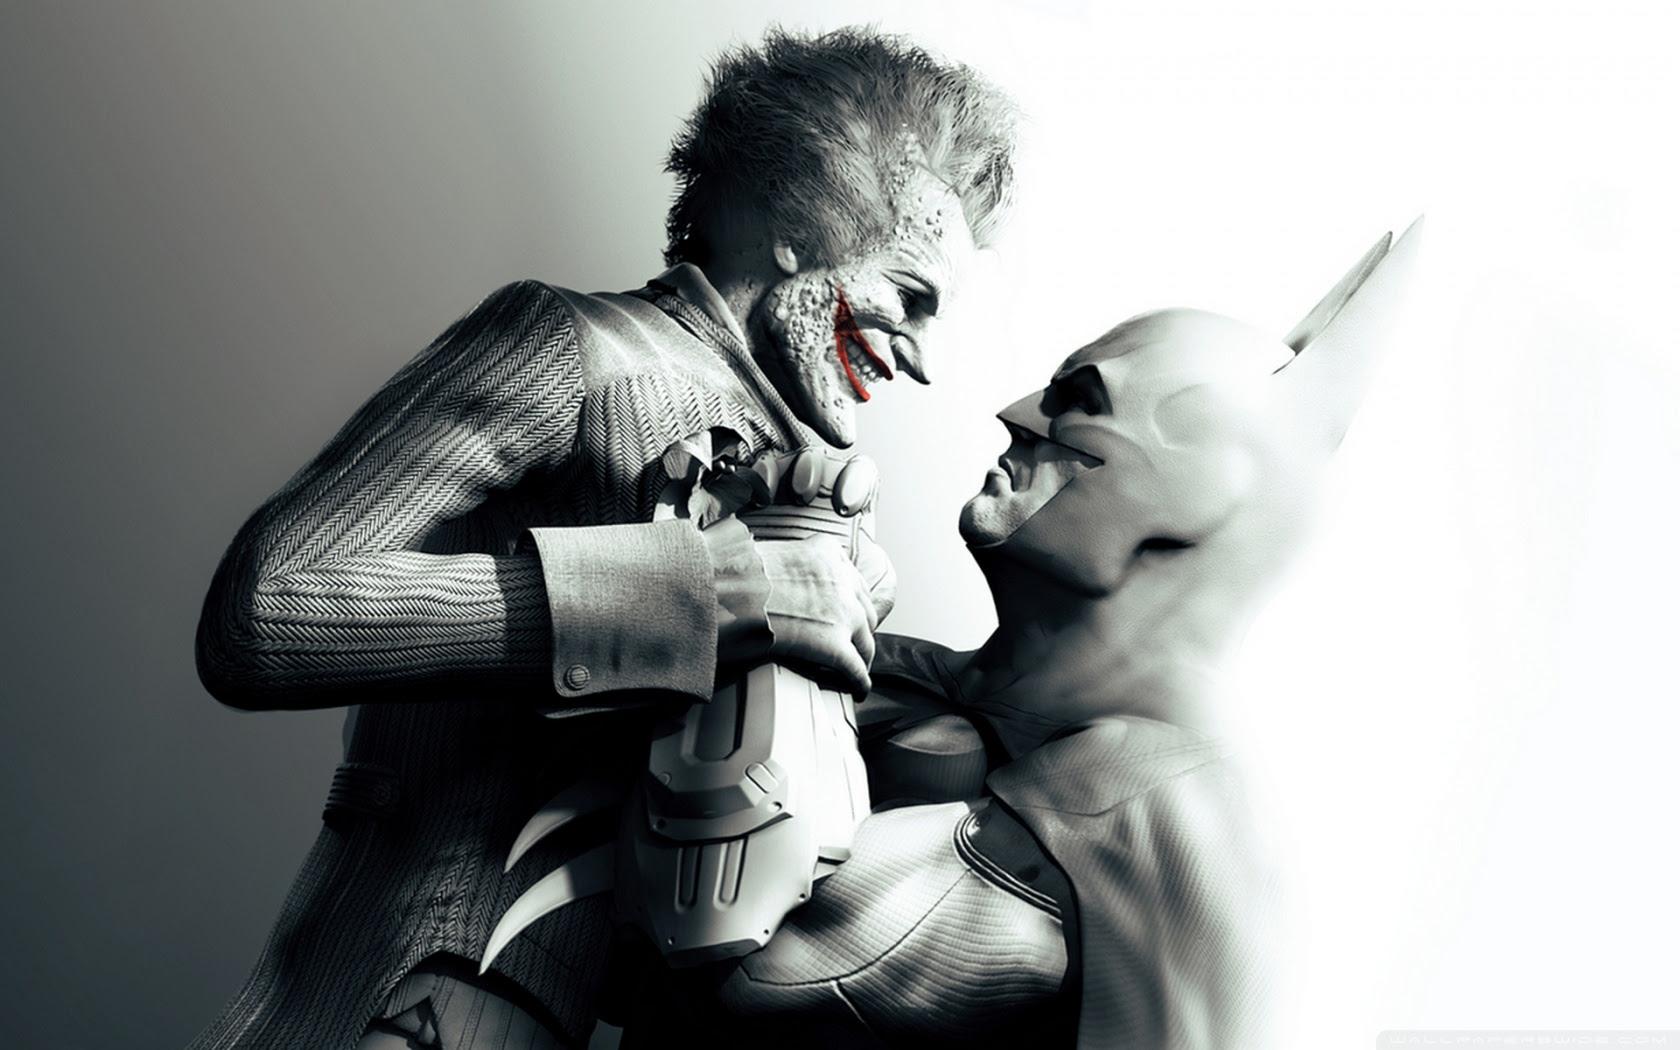 Batman Arkham City Wallpaper Hd Desktop Wallpapers